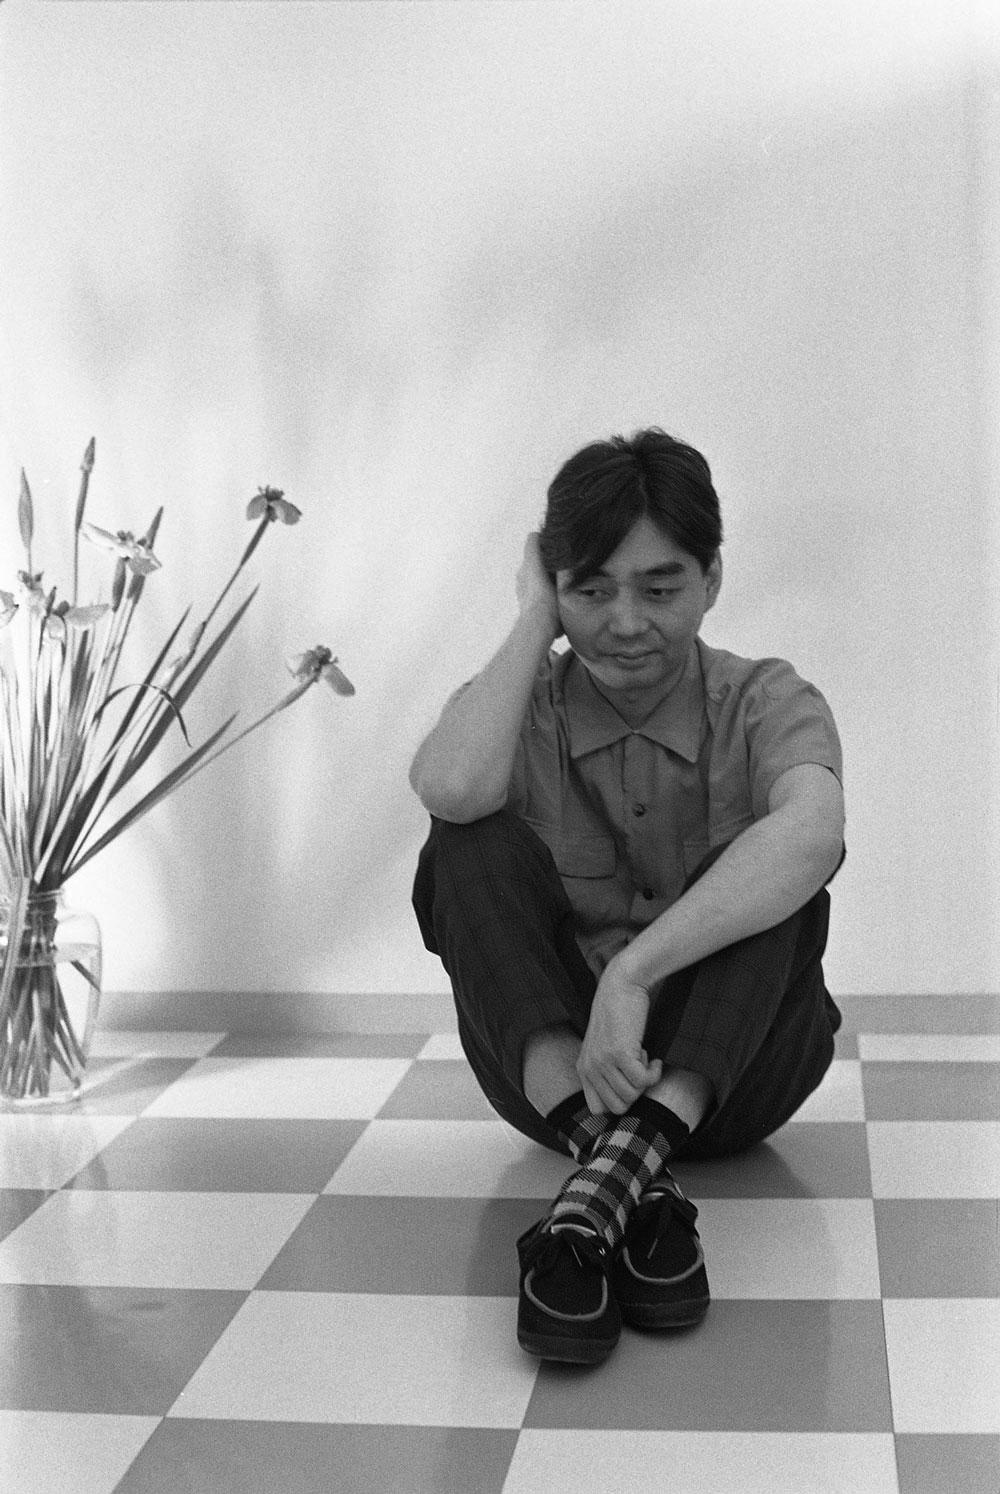 1560347649676-Haruomi-Hosono-courtesy-of-The-Masahi-Kuwamoto-Archives